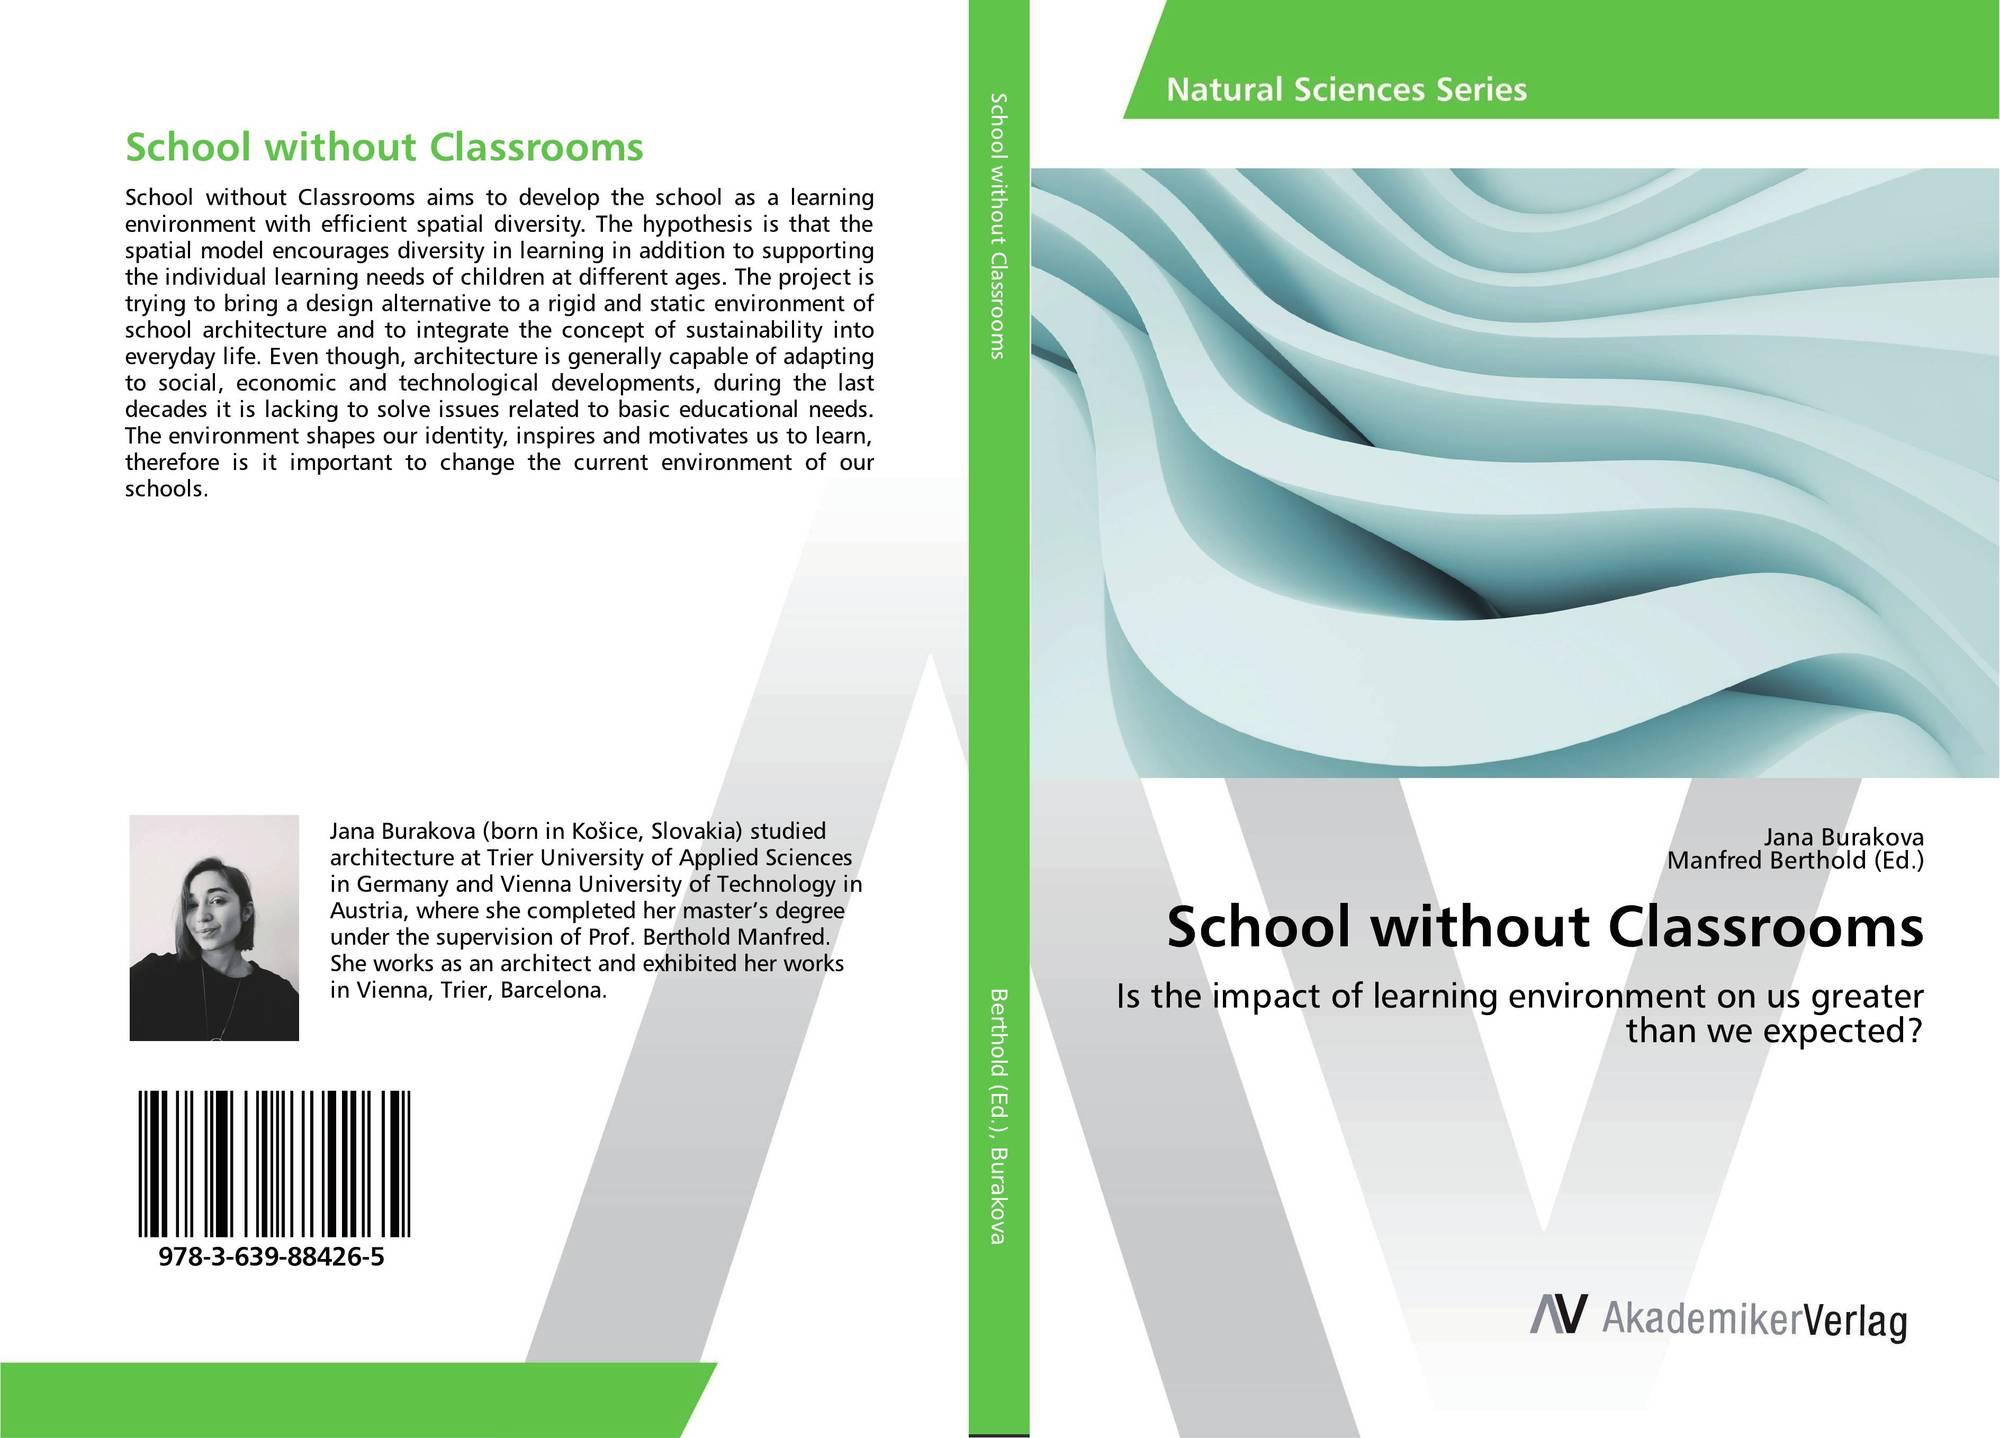 publication listav akademikerverlag, 2019, isbn 978 3 639 88426 5; 164 pages